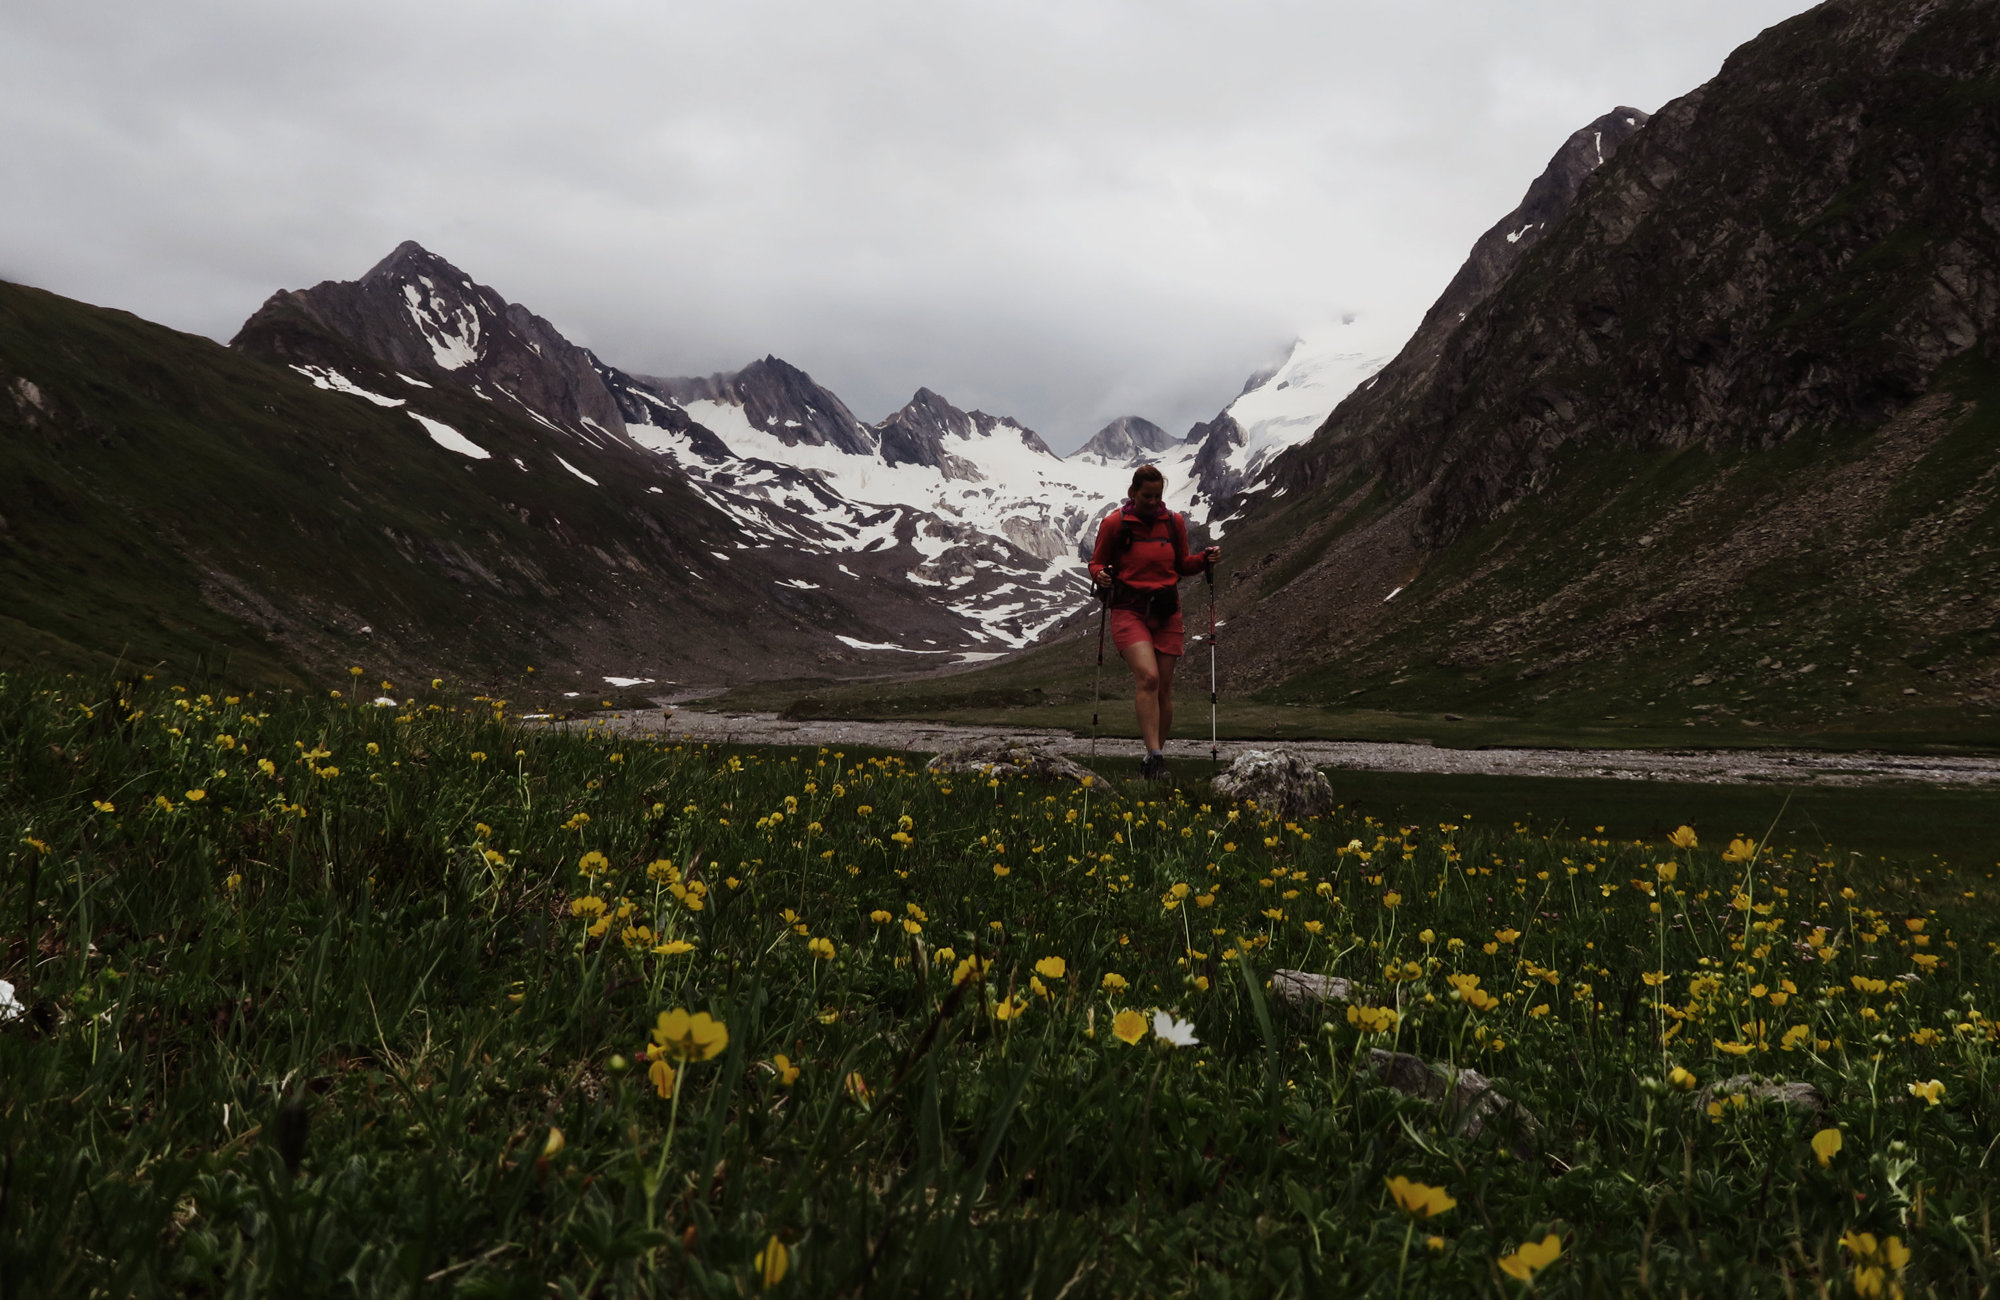 Durch Blumenfelder bis zum Rotmoosferner, Wandertour Rotmoosferner und Gaisbergtal, Wandern im Ötztal, Wandertour Ötztal, Alpen, Tirol, Gletscher